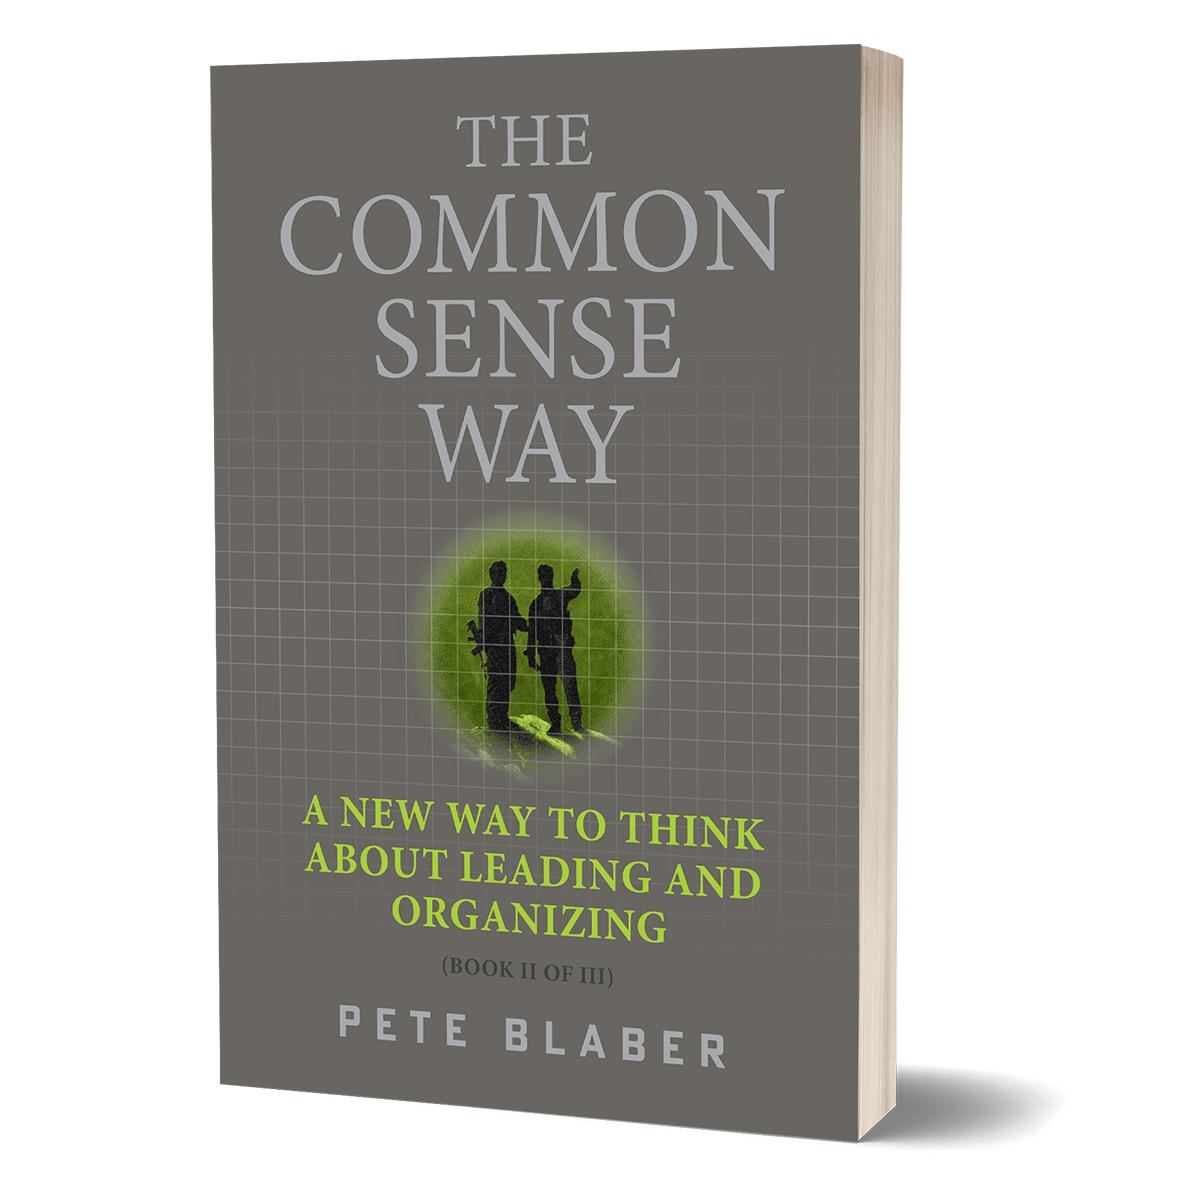 The Common Sense Way Book